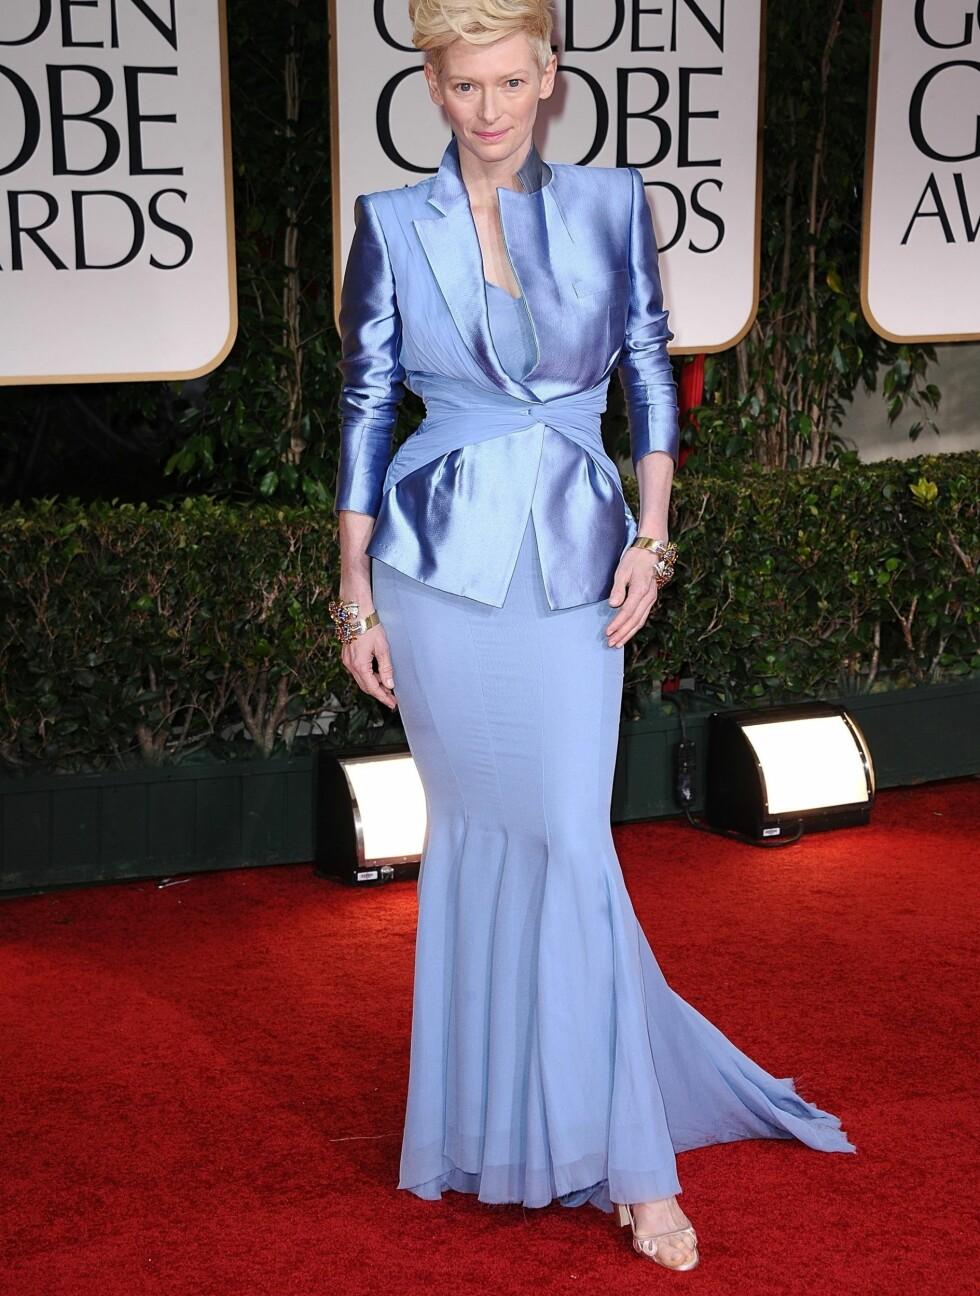 ISBLÅTT: Tilda Swinton kom i en isblå kjole med matchende jakke.  Foto: Stella Pictures